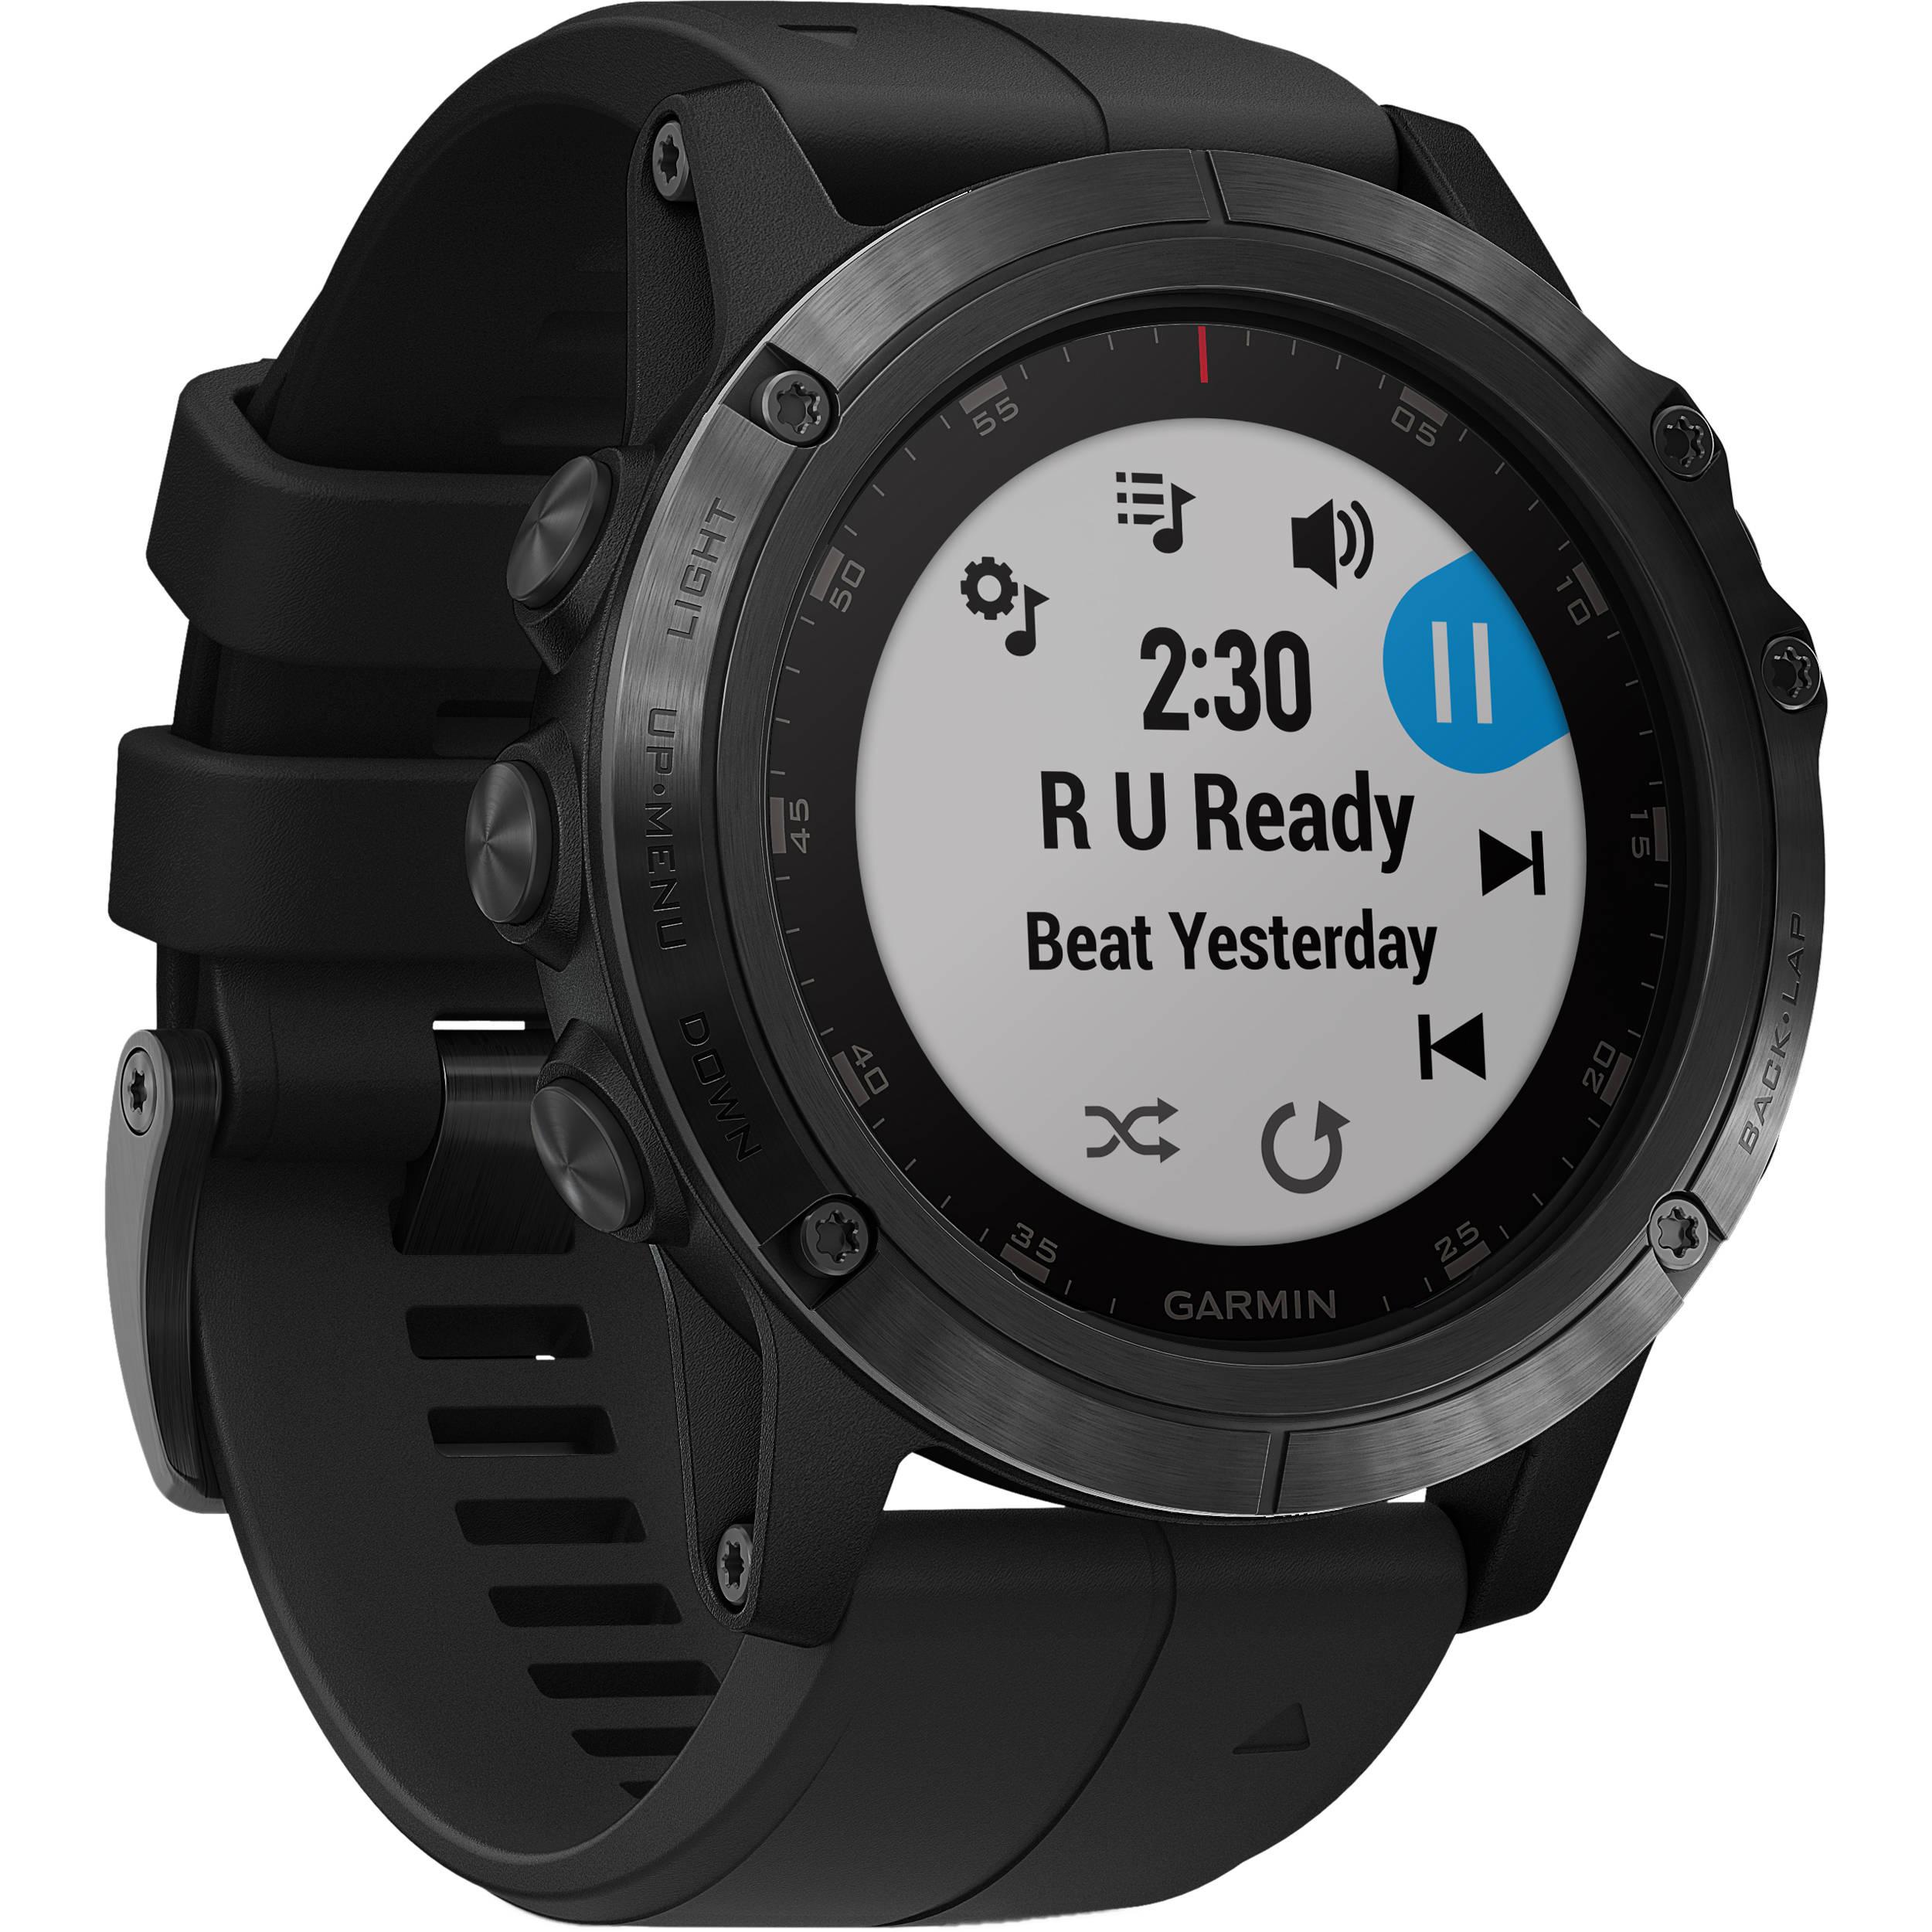 Garmin Fenix 5x Plus Sapphire Edition Multi Sport Training Gps Watch 51mm Black With Black Band